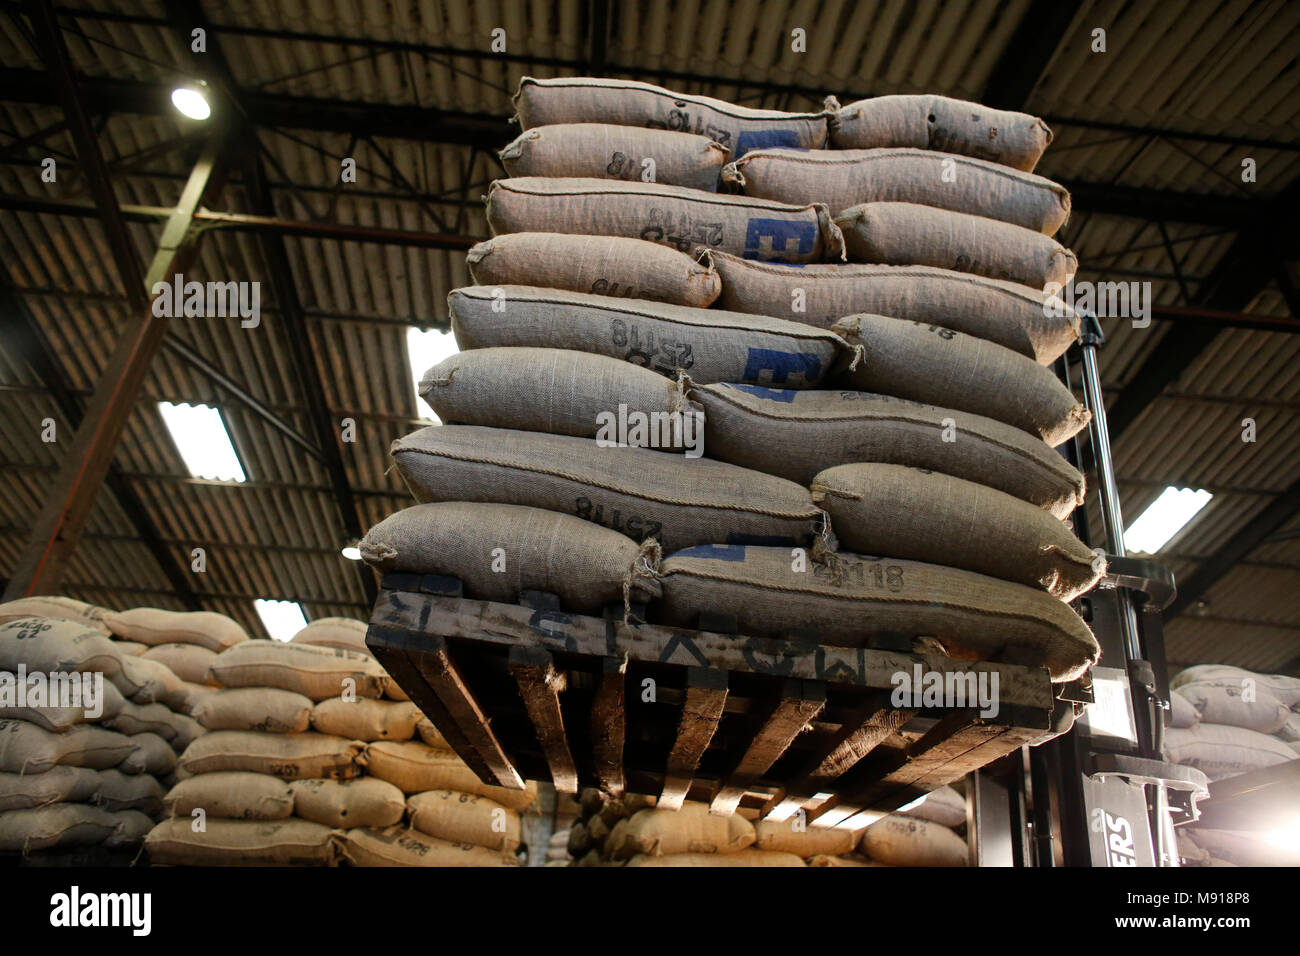 Cocoa warehouse at Abidjan port facilities, Ivory Coast. - Stock Image